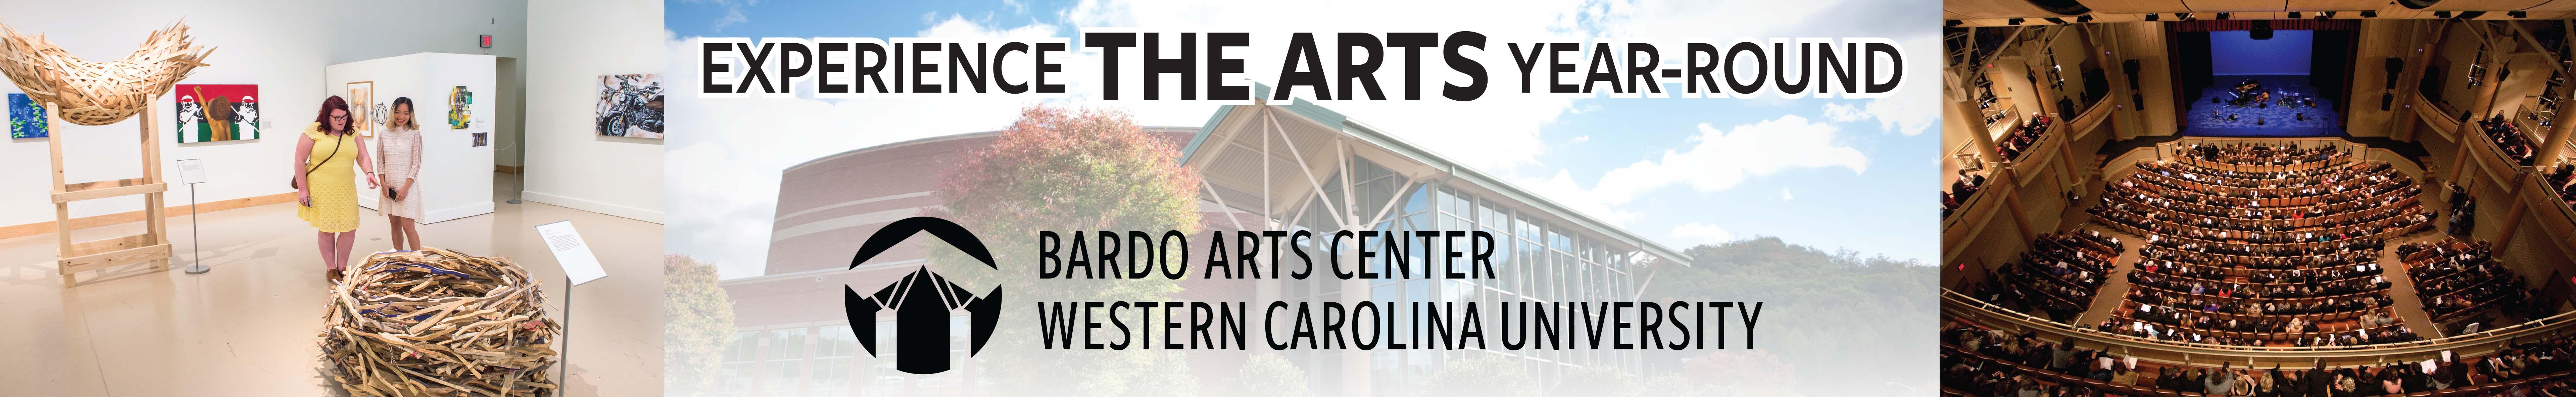 Bardo Arts Center